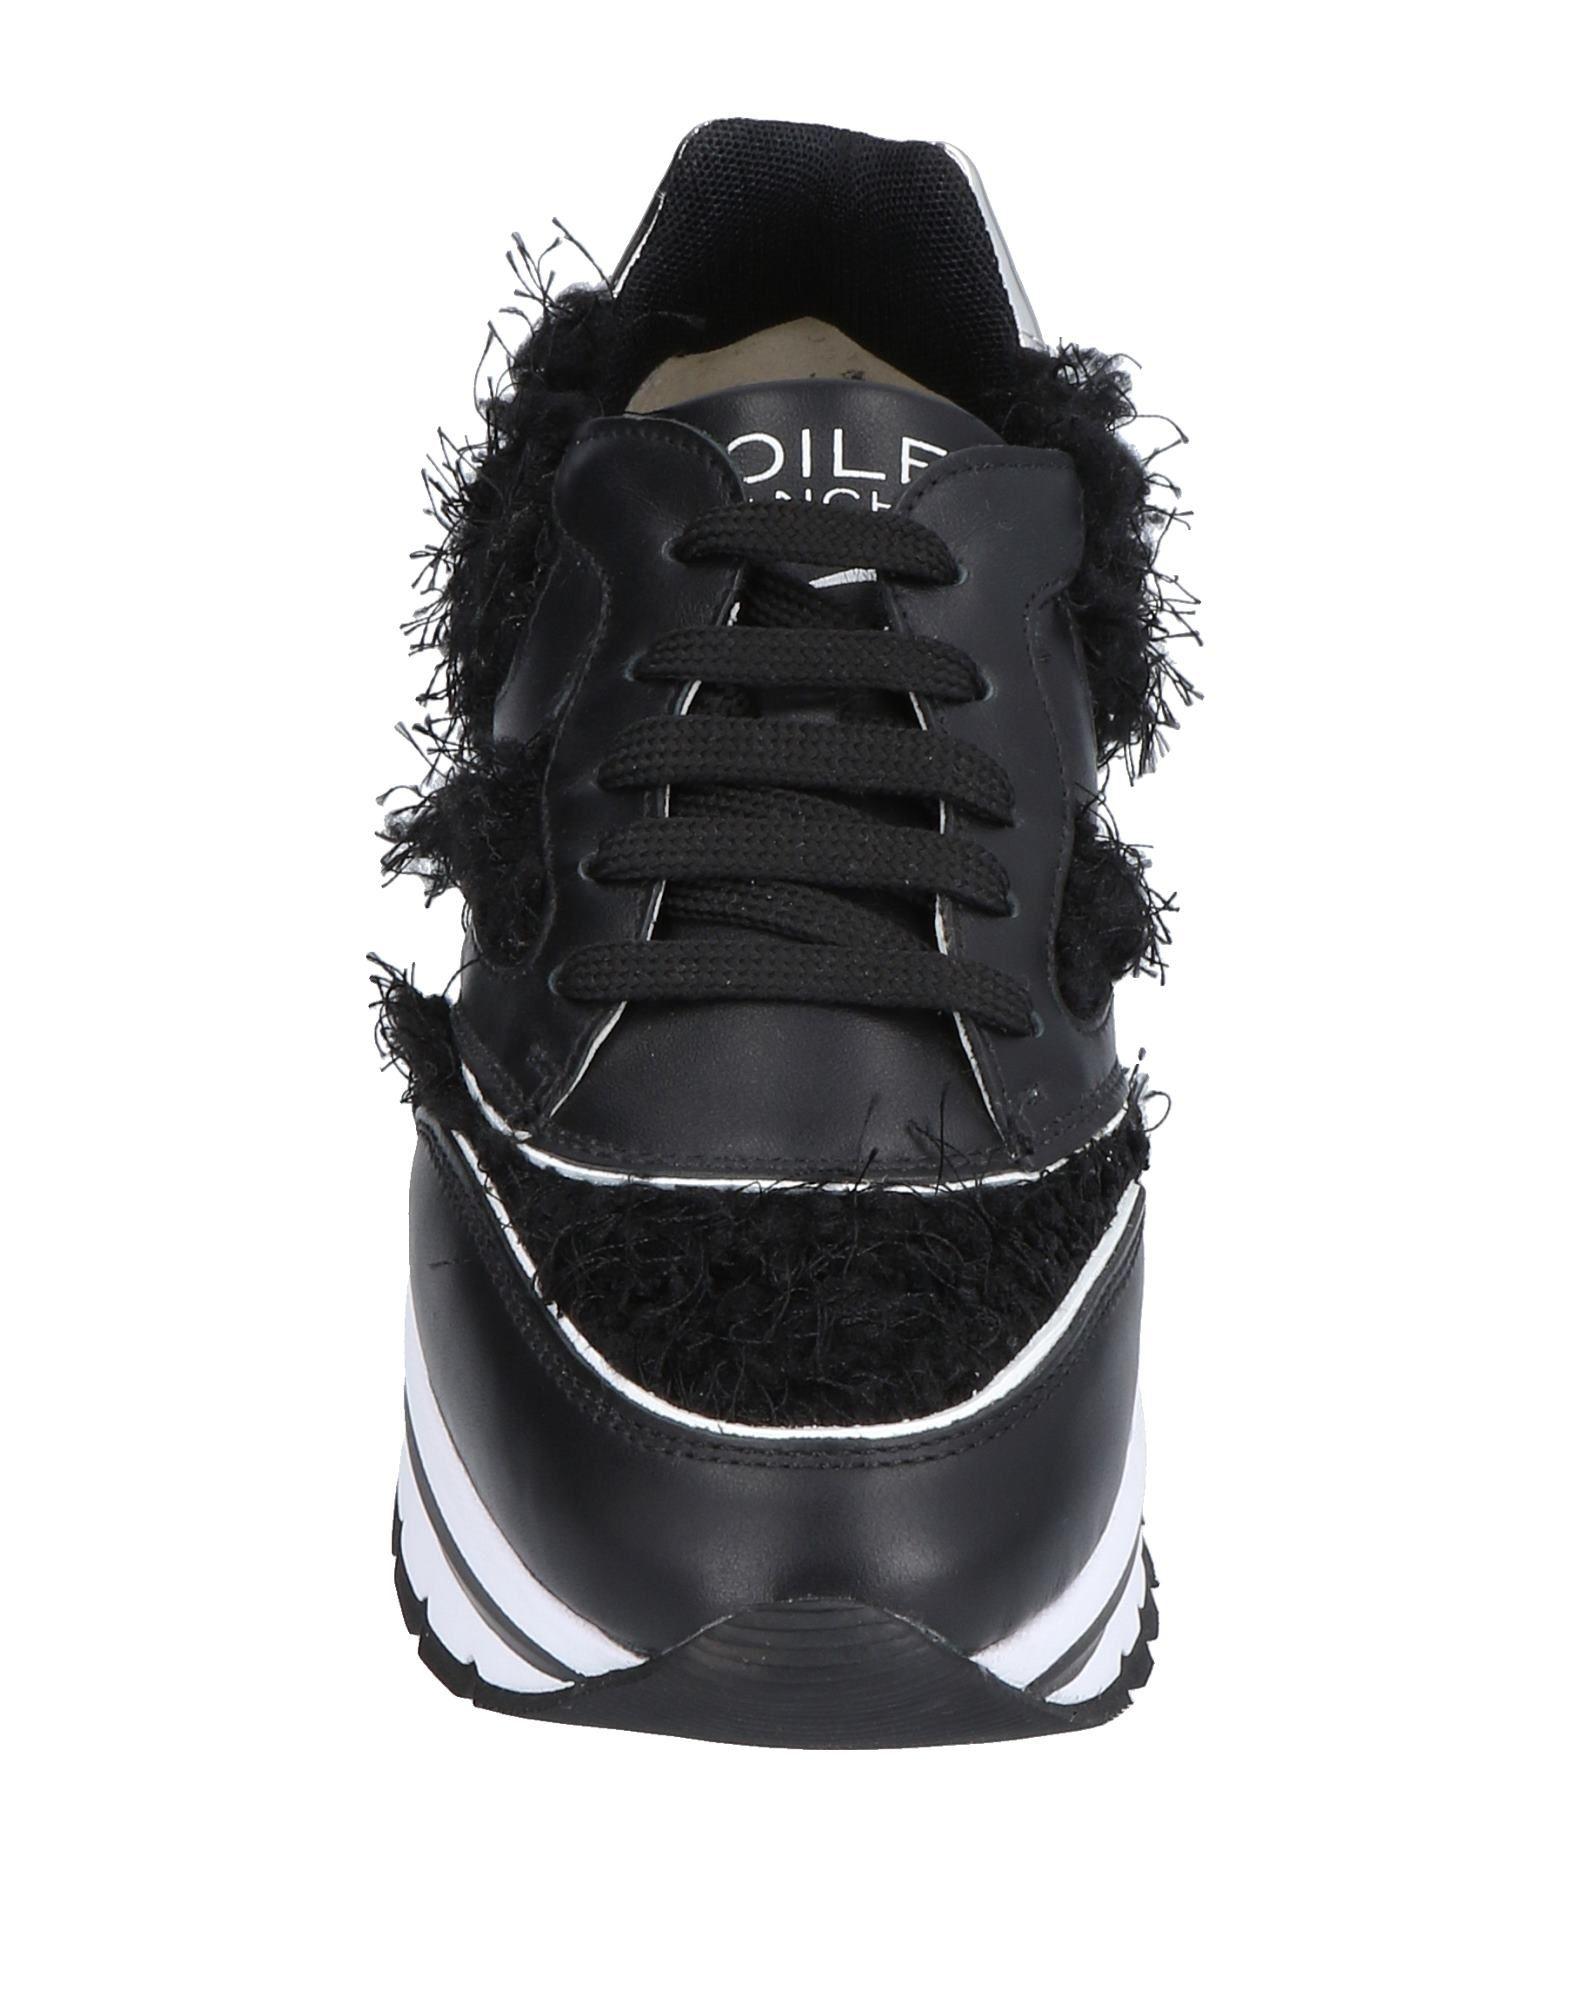 Voile Blanche Sneakers Damen 11502350JL  11502350JL Damen 5585ef